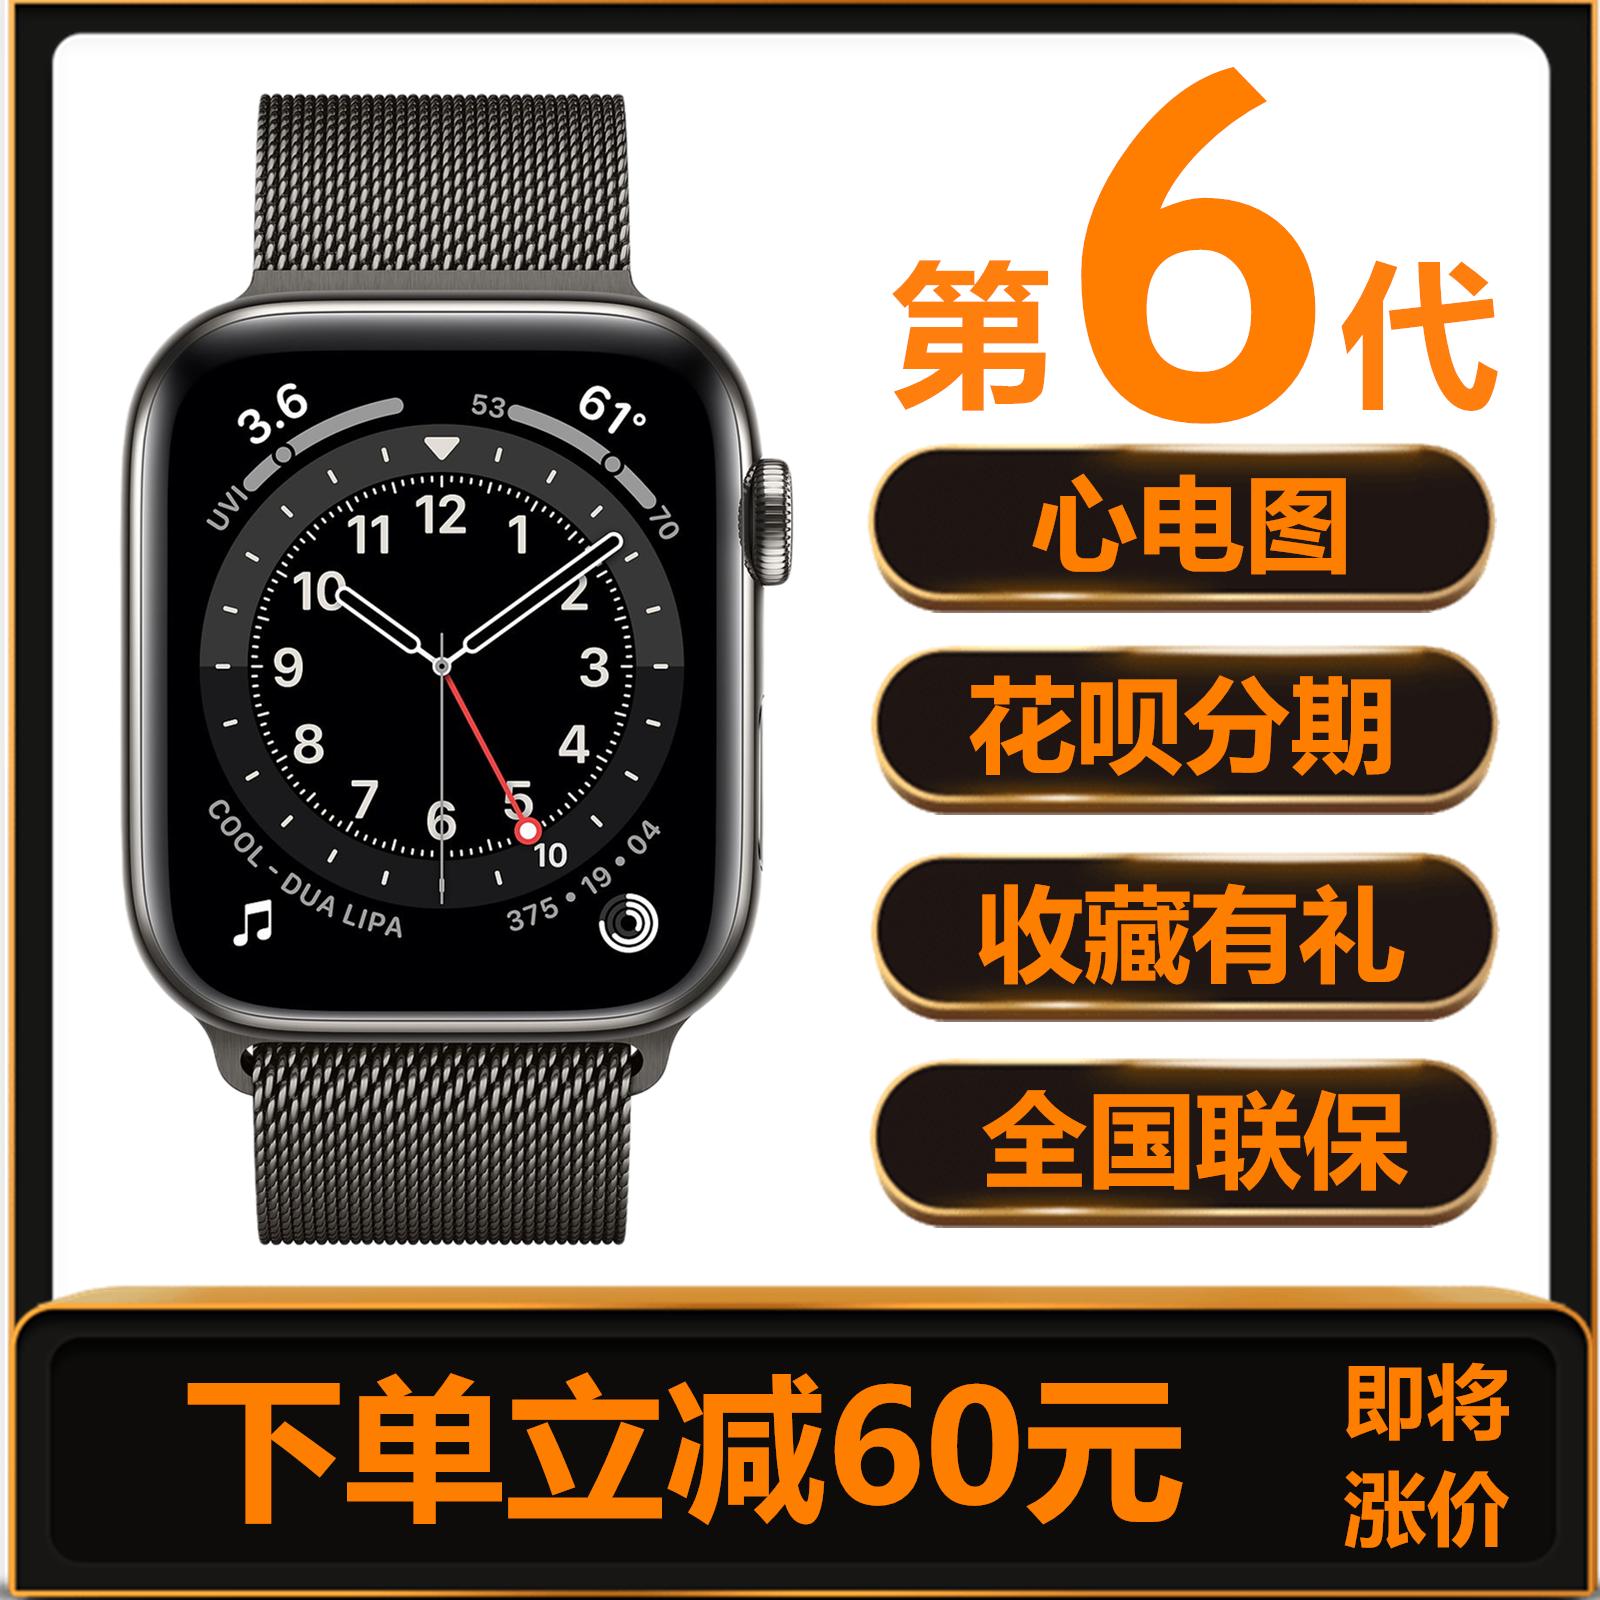 ヶ⊗สามารถโทรหาฉลาดApple Watch Series6 Generation 5 iwatch Apple Sports Smart Watch Honeycomb/S4/SE Staging